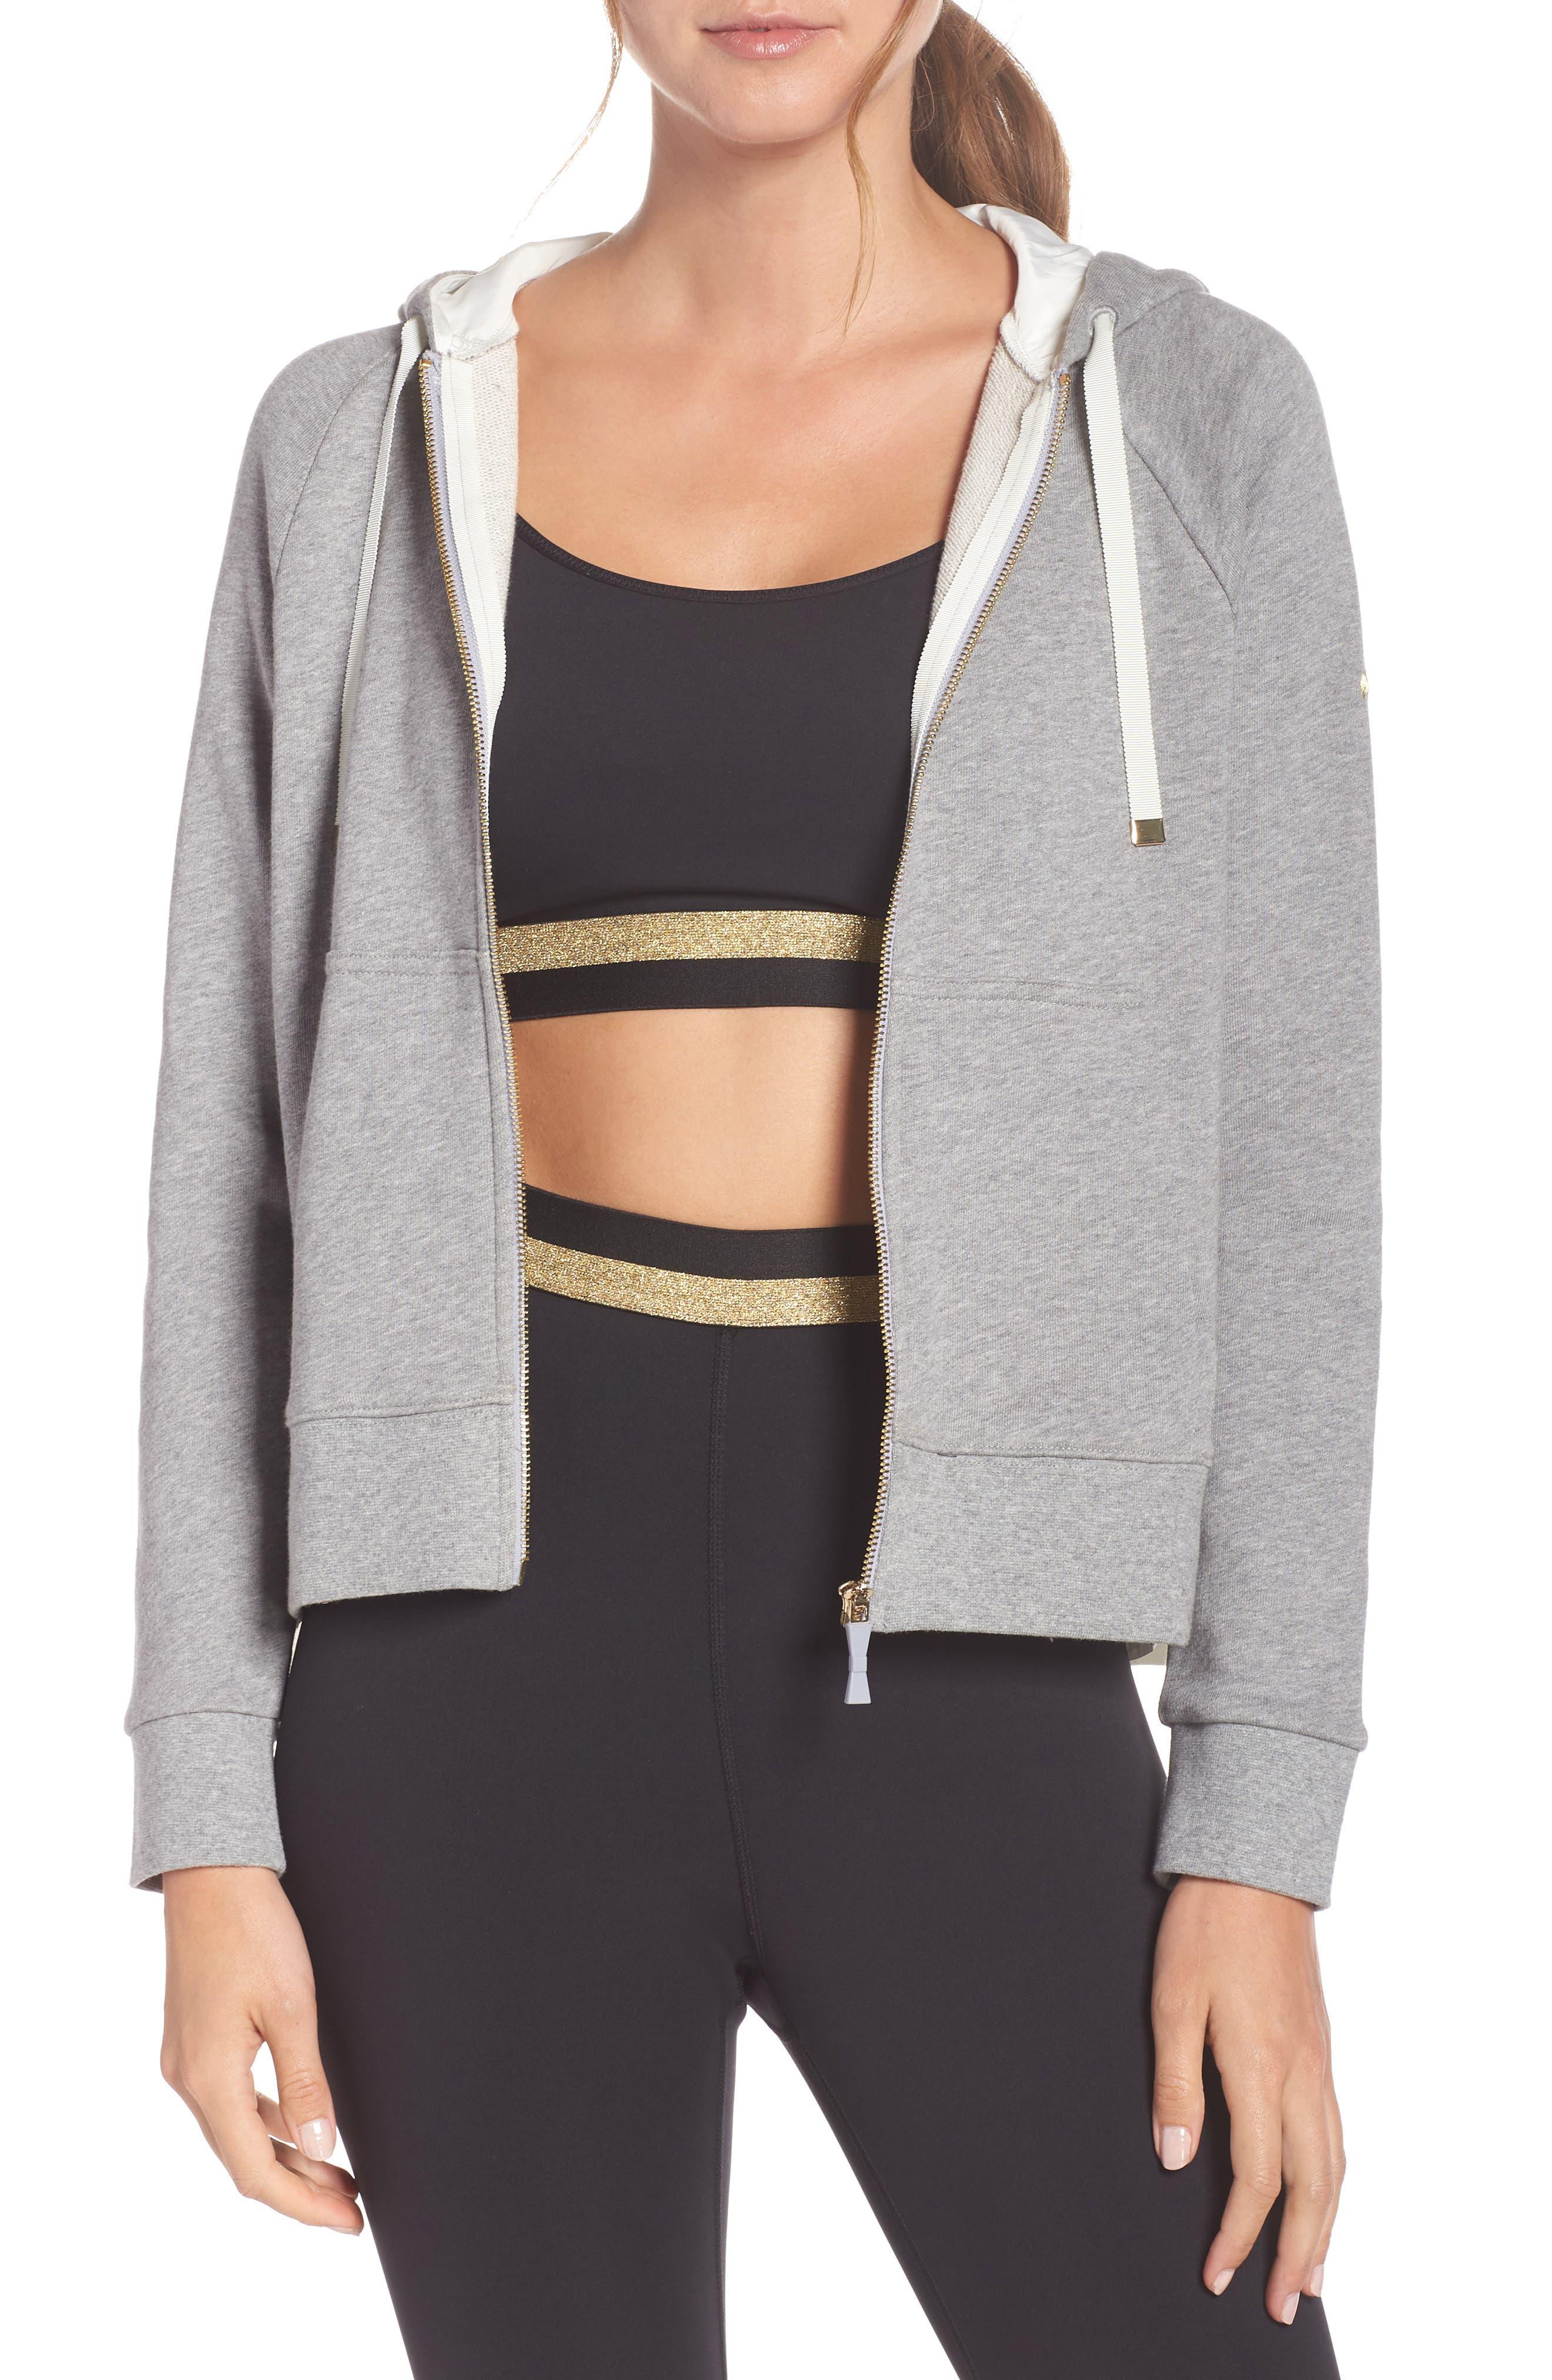 Kate Spade New York Mixed Media Full Zip Sweatshirt, Grey